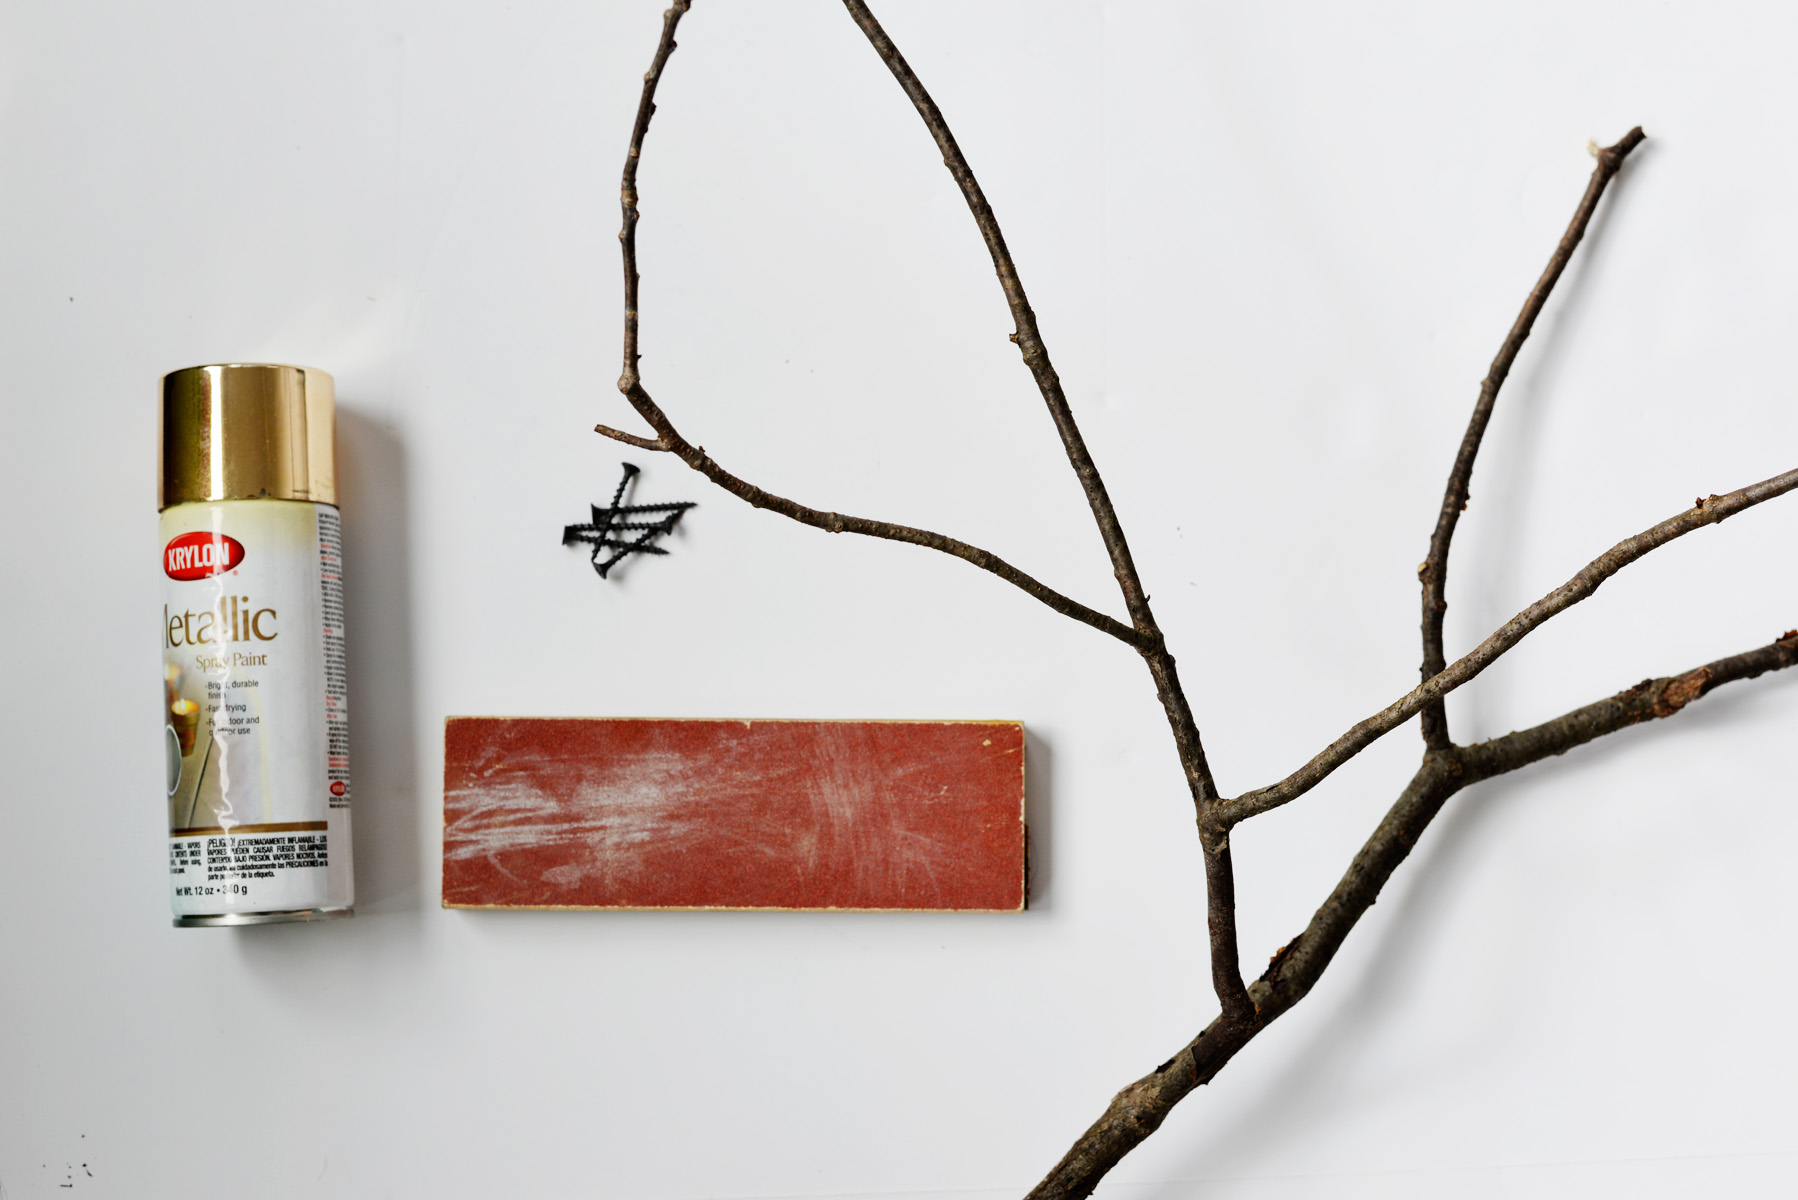 DIY Jewelry Branch supplies